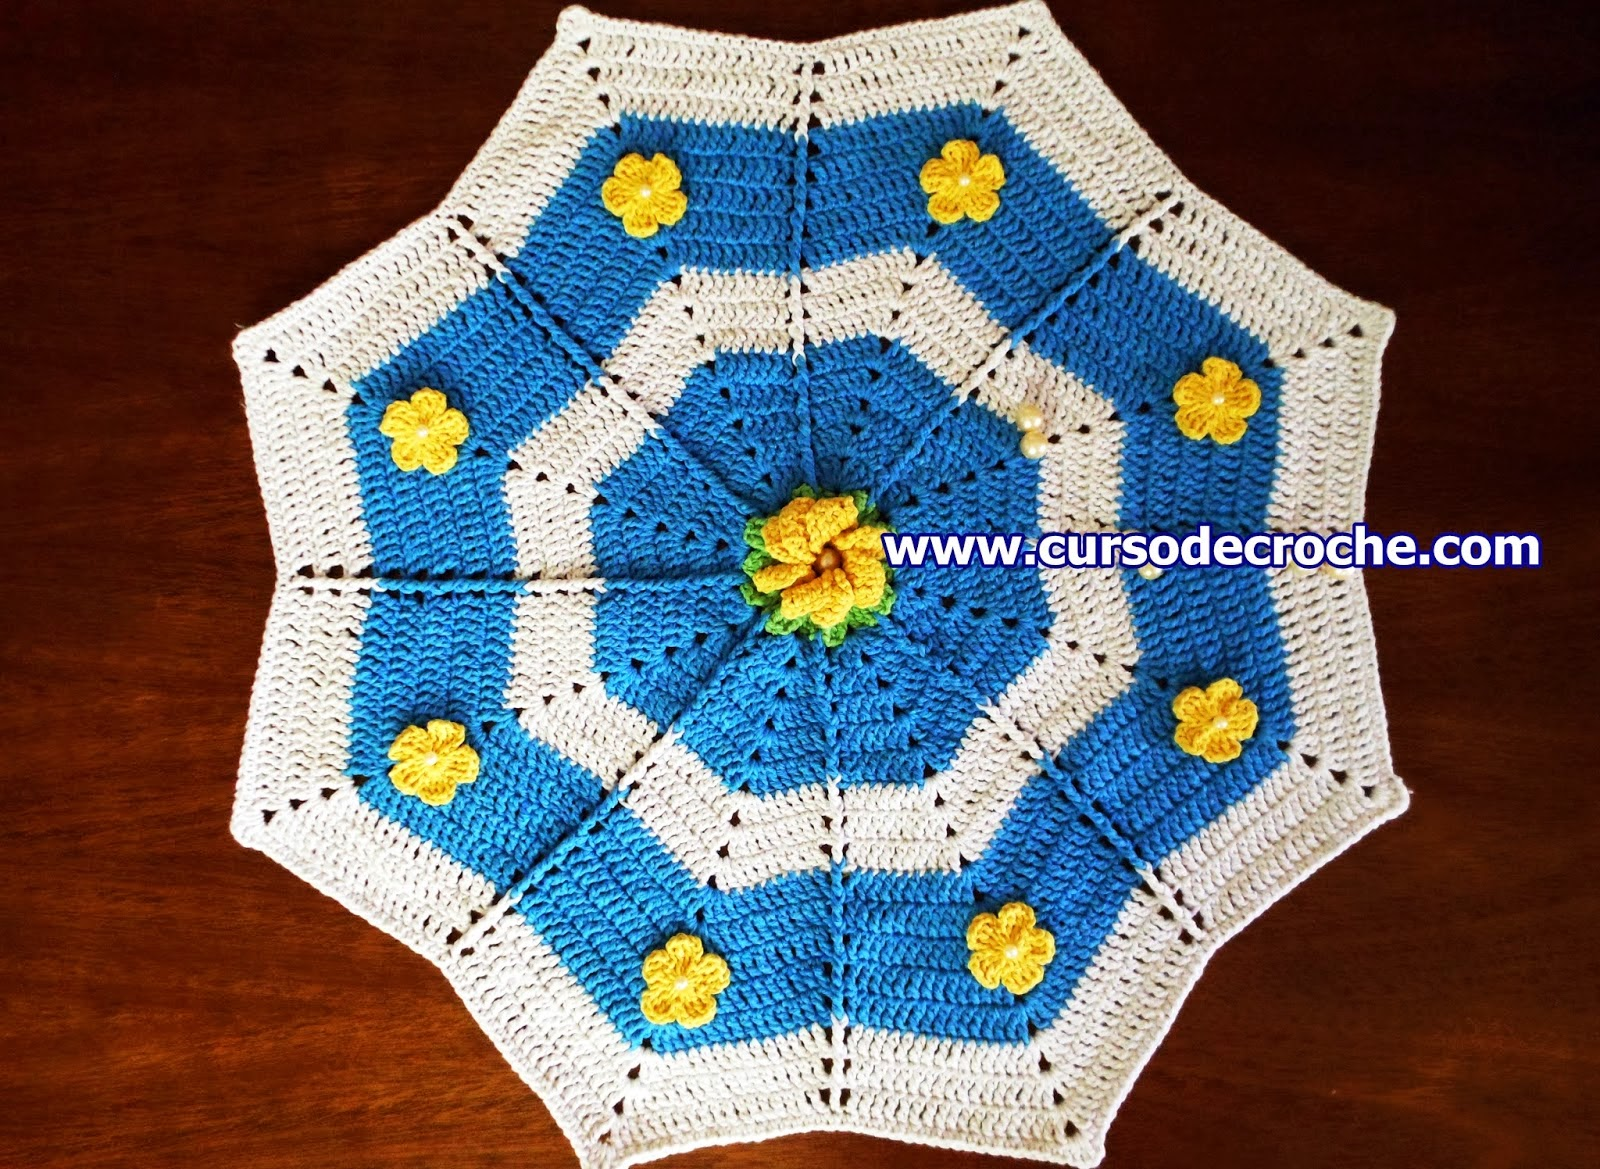 aprender croche estrelas tapetes florais réveillon mesa edinir-croche loja dvd video-aulas curso de croche frete gratis